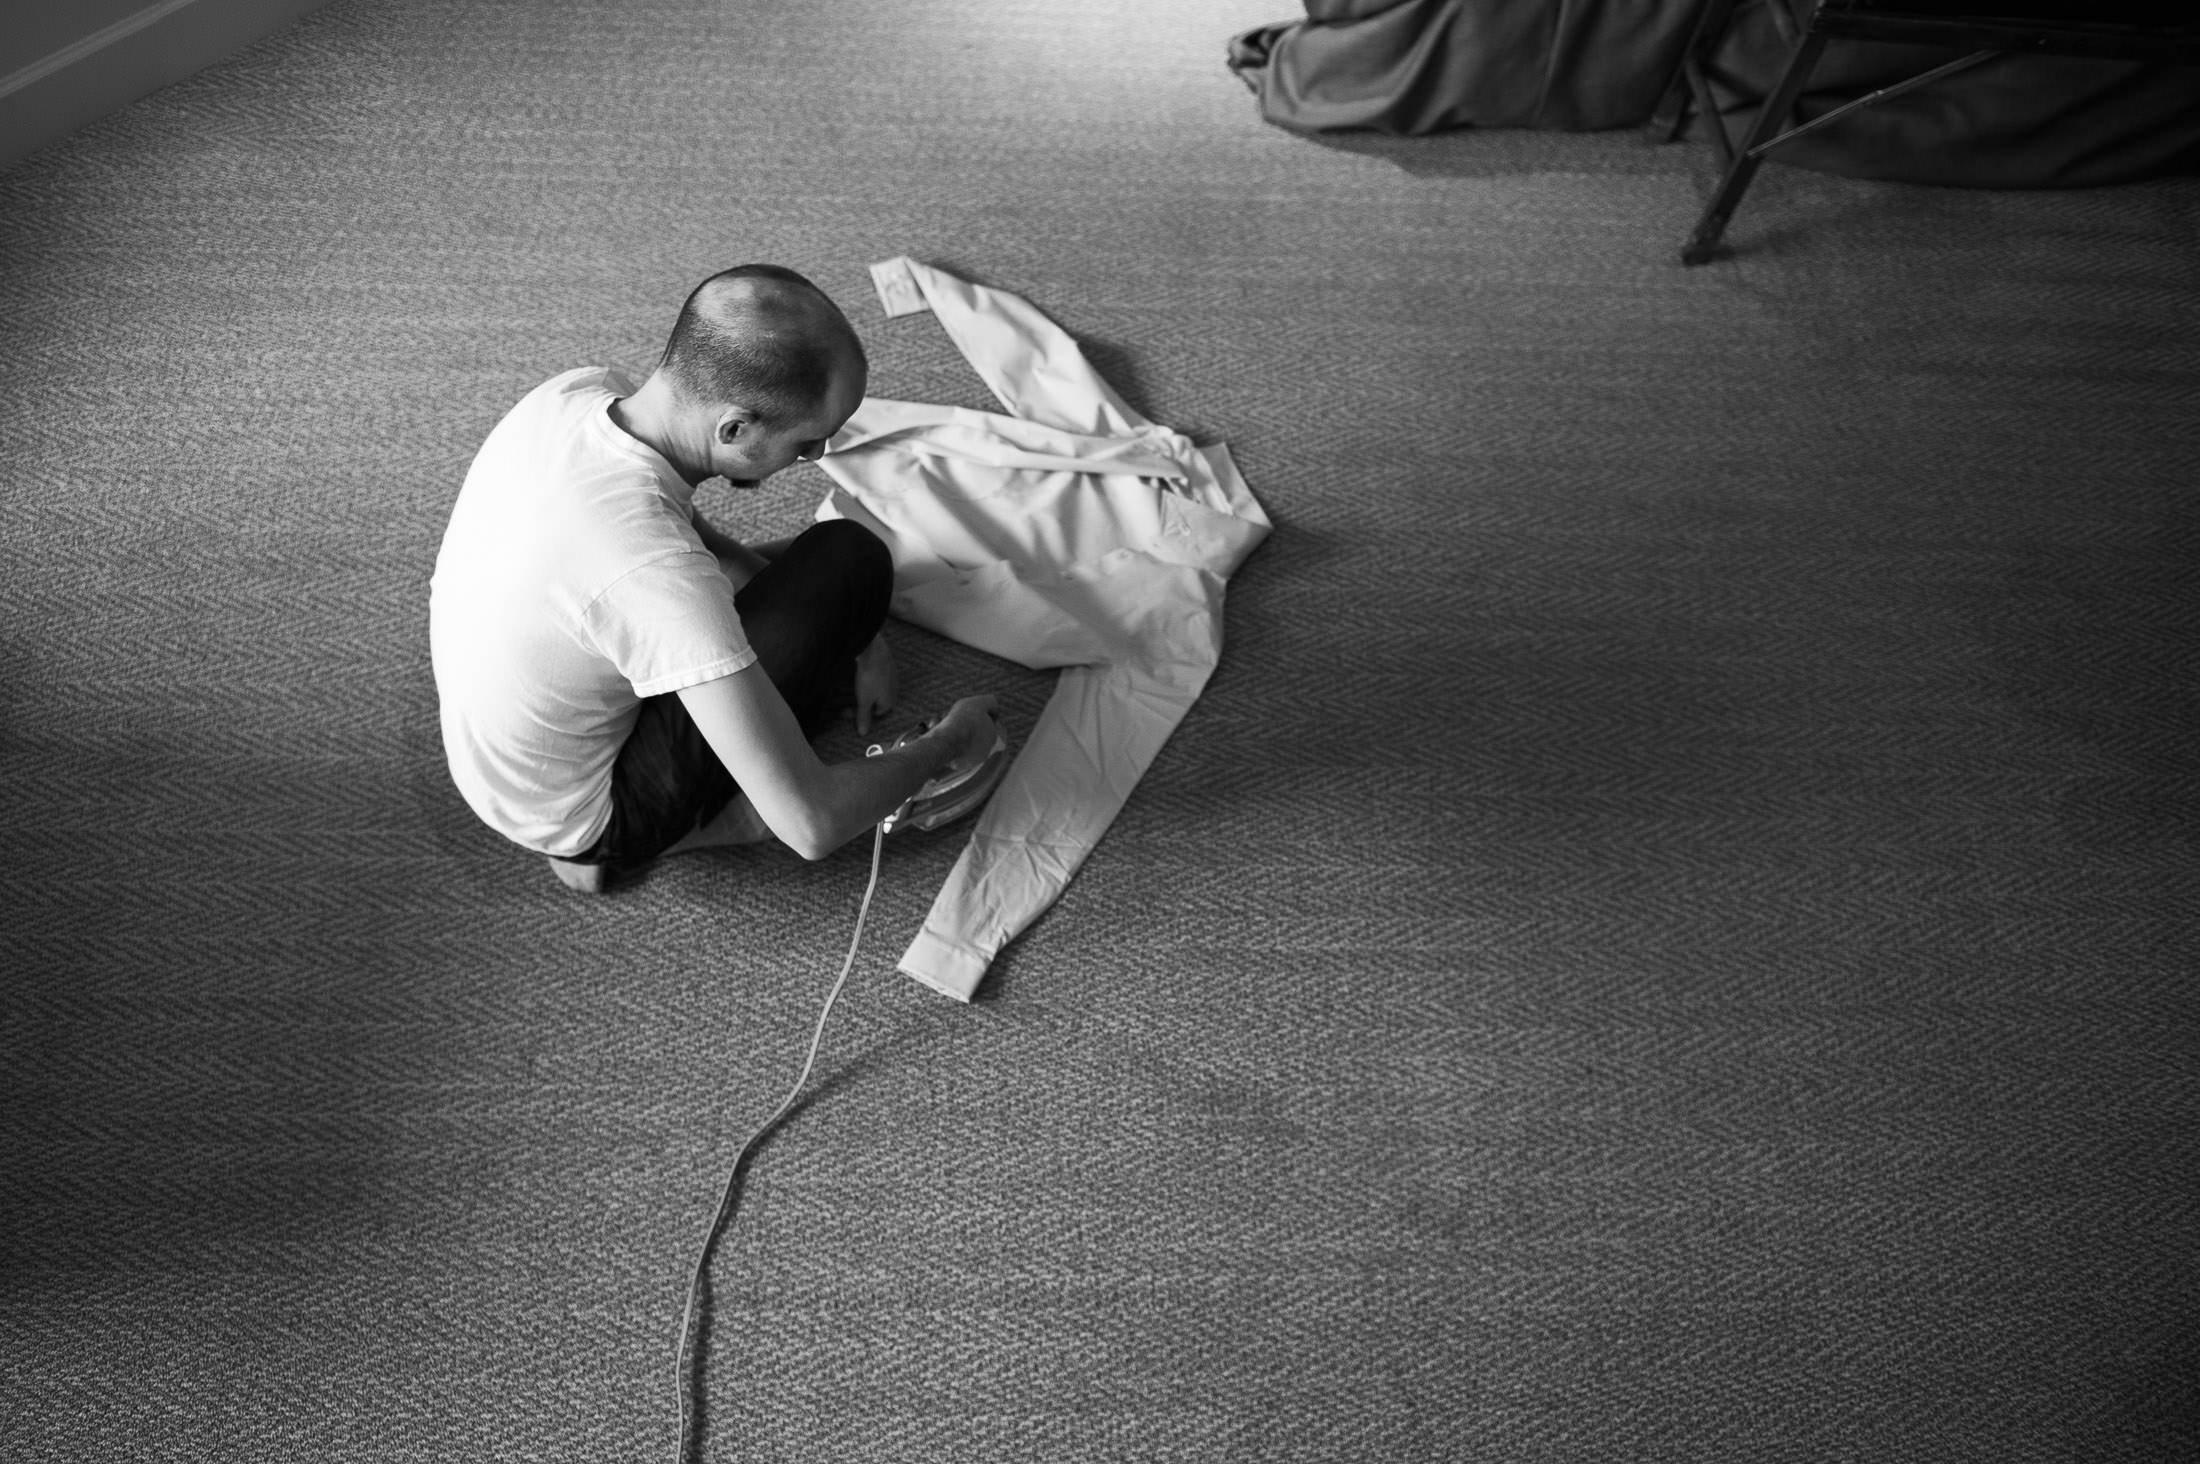 groom ironing shirt before wedding at Ramekins Culinary School